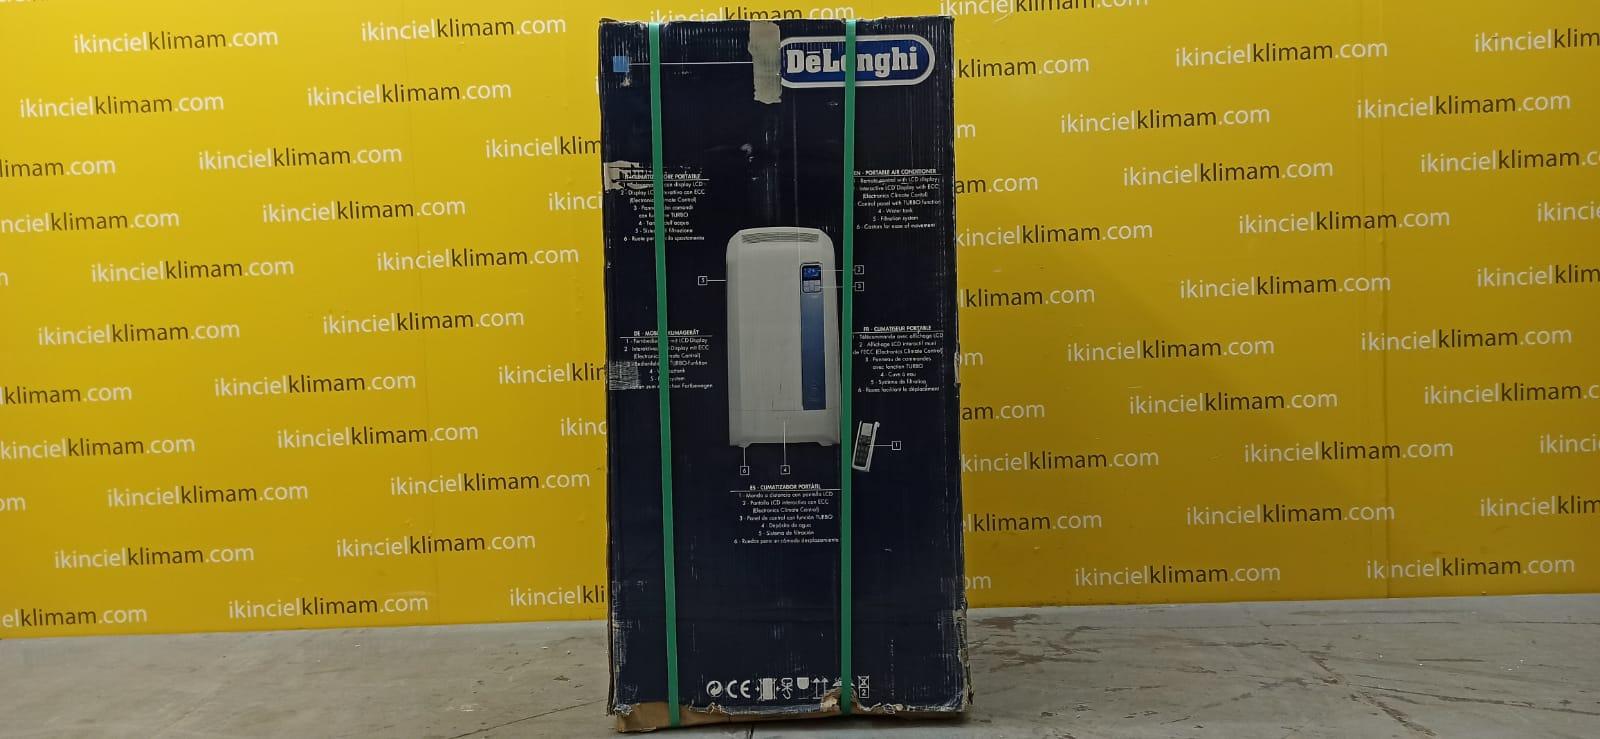 DELONGI PAC WE110ECO Pinguino ( Sadece Soğutma )  Enerji Sınıfı 11000 BTU On-Off  Klima